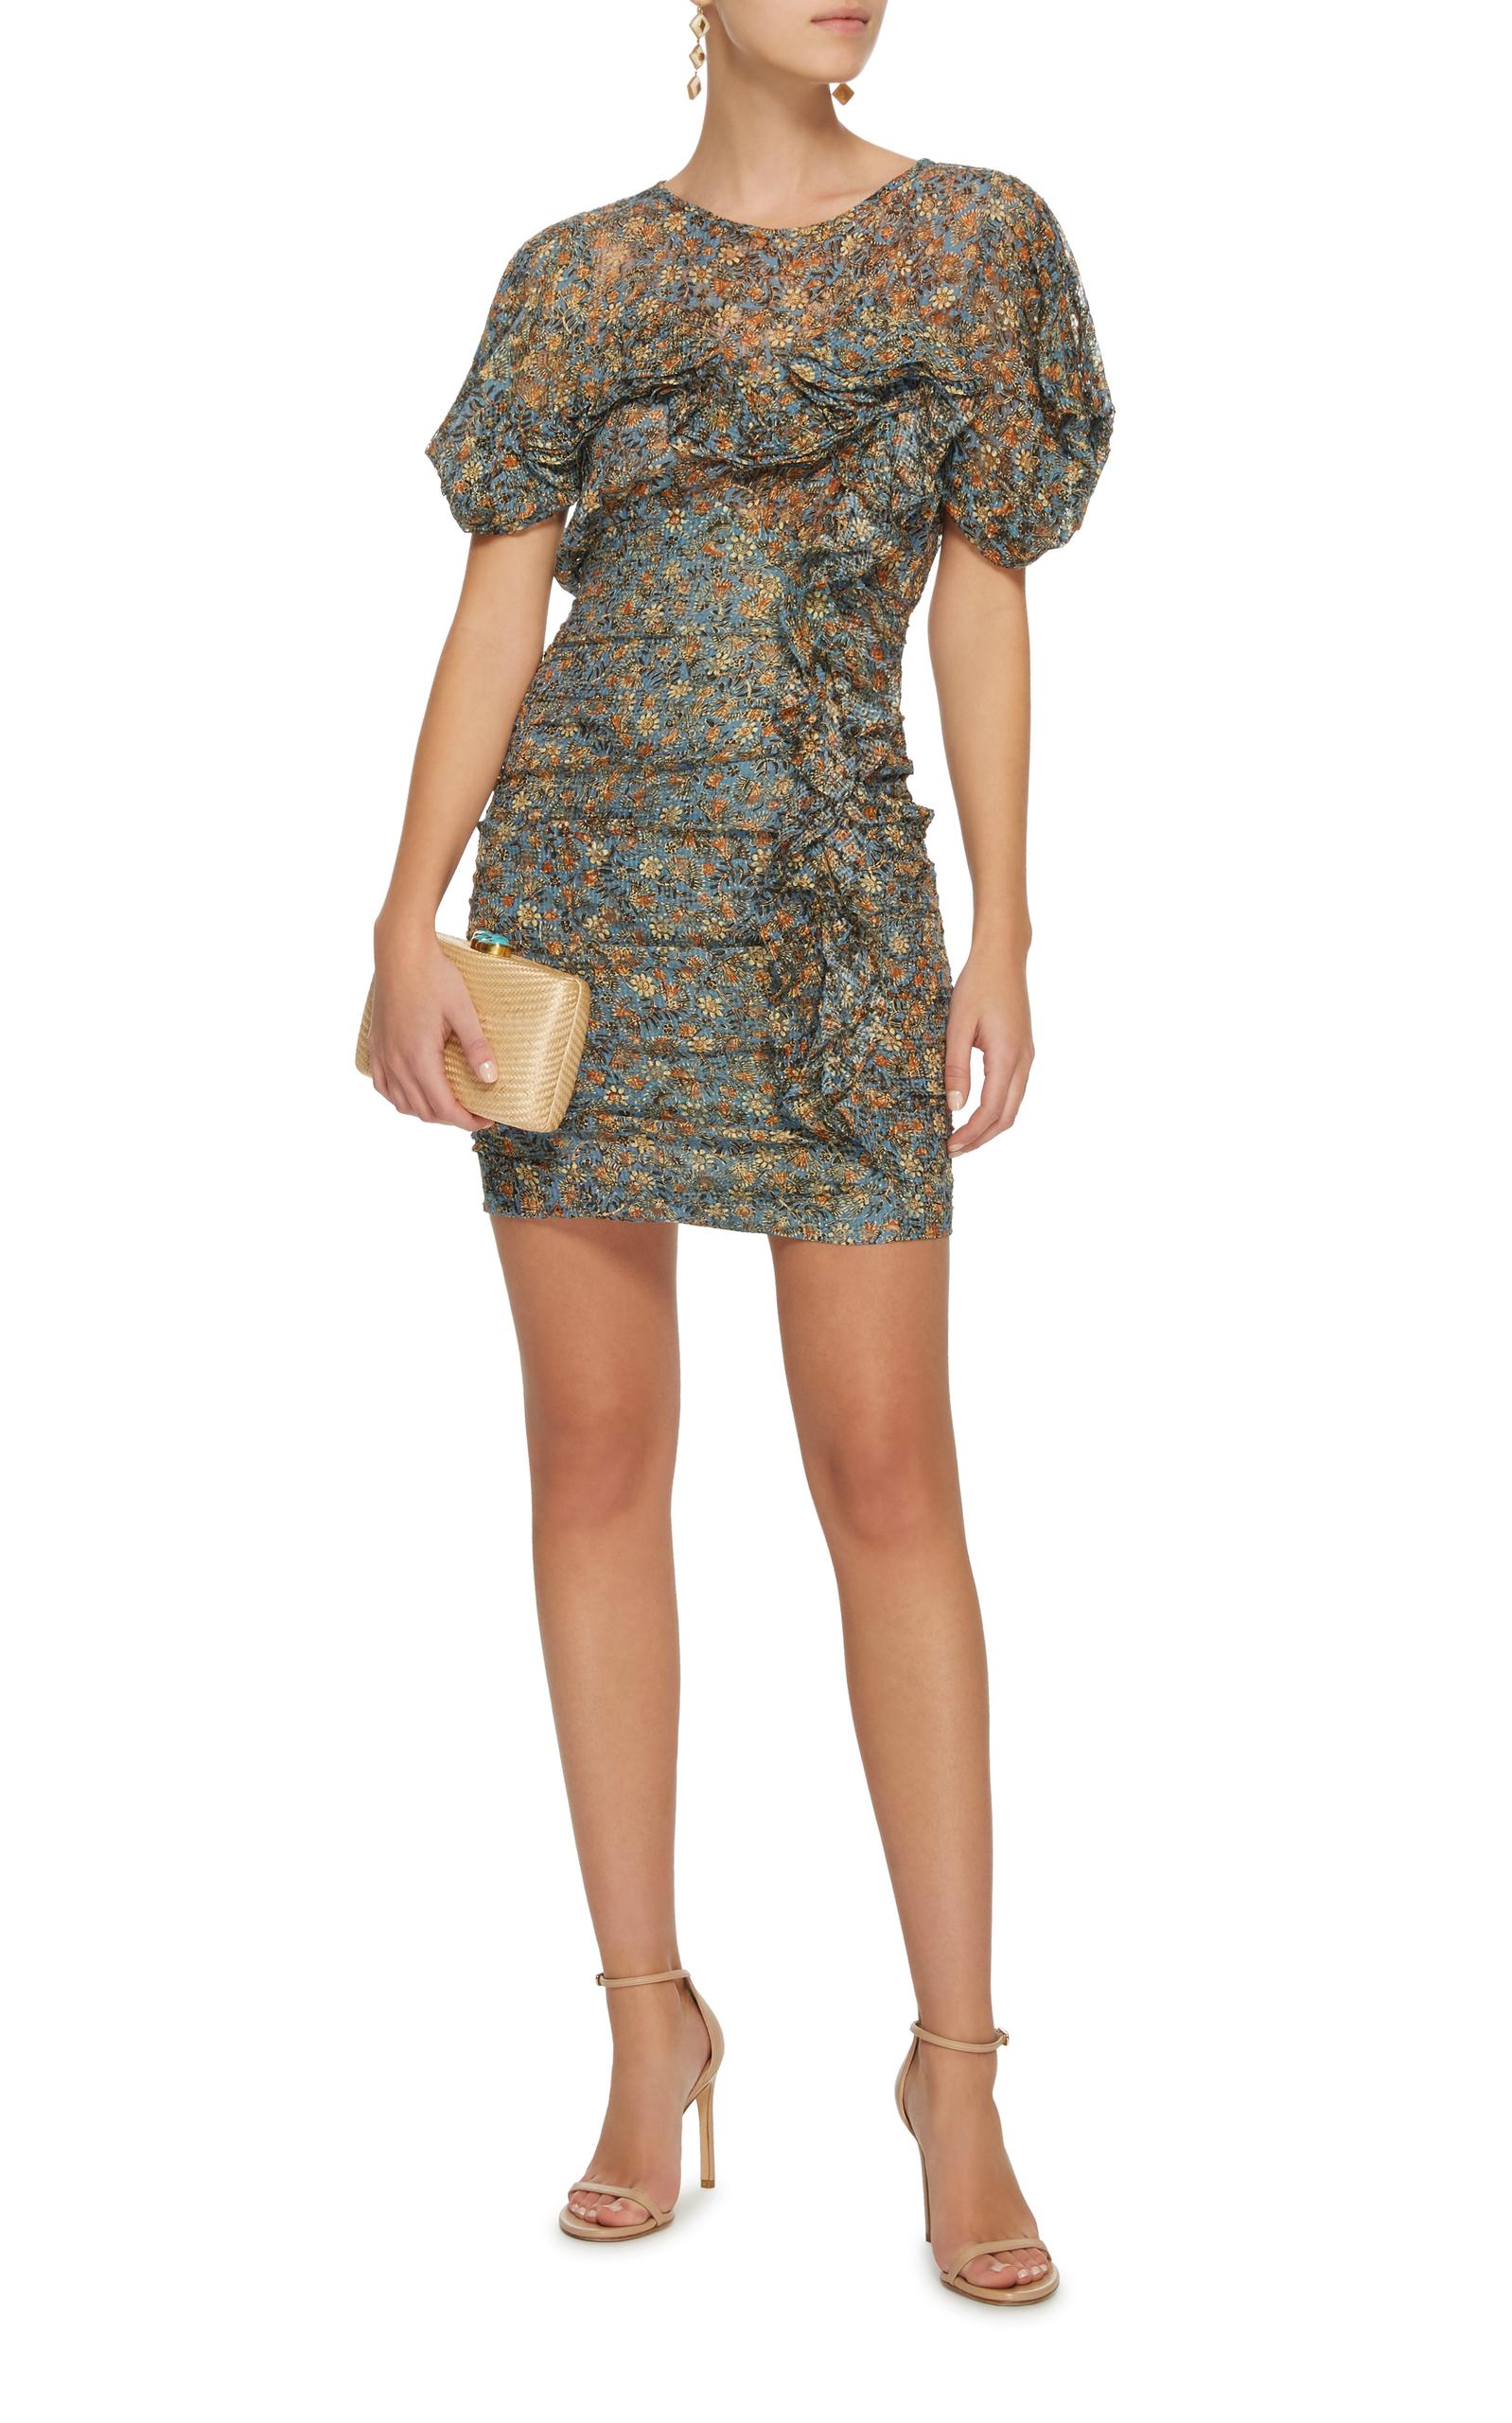 Face Ruffled Sheath Mini Dress Isabel Marant 3XiOemD